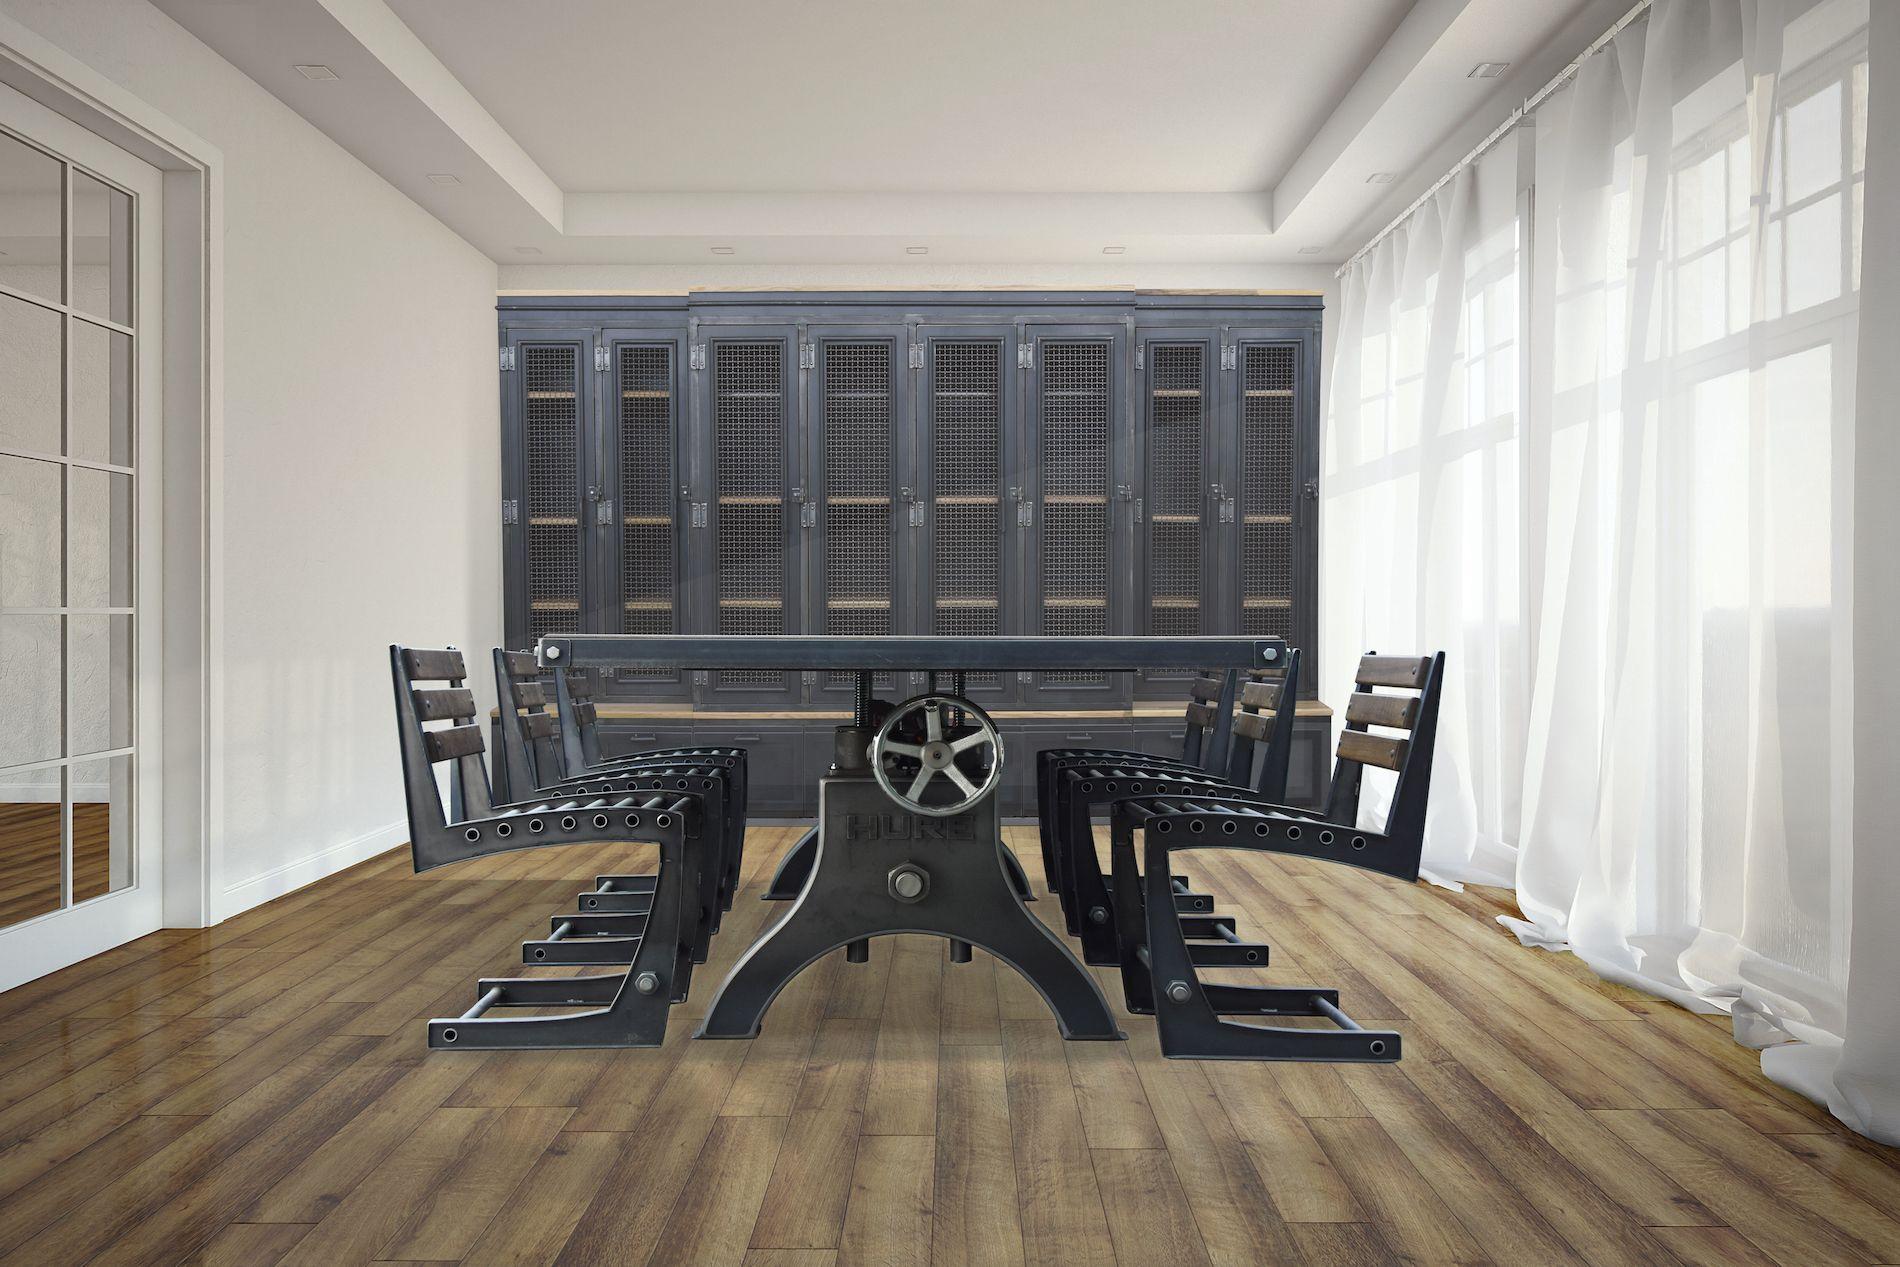 Hure crank table vintage industrial furniture - Hure Crank Table Large Drawerstable Vintagevintage Industrial Furnitureindustrial